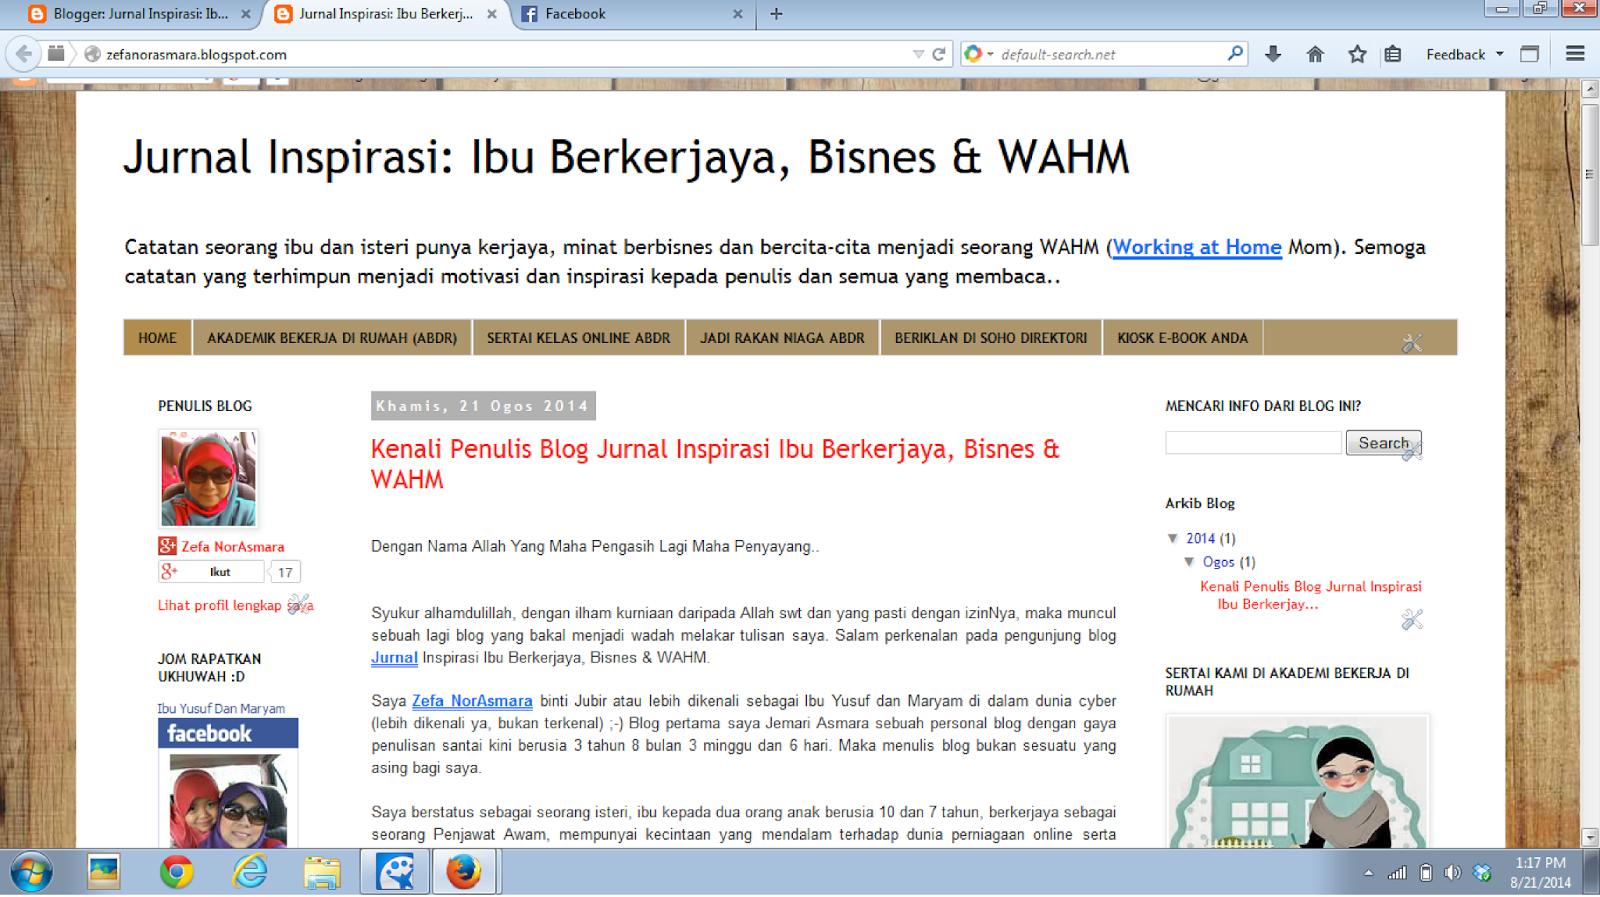 http://zefanorasmara.blogspot.com/